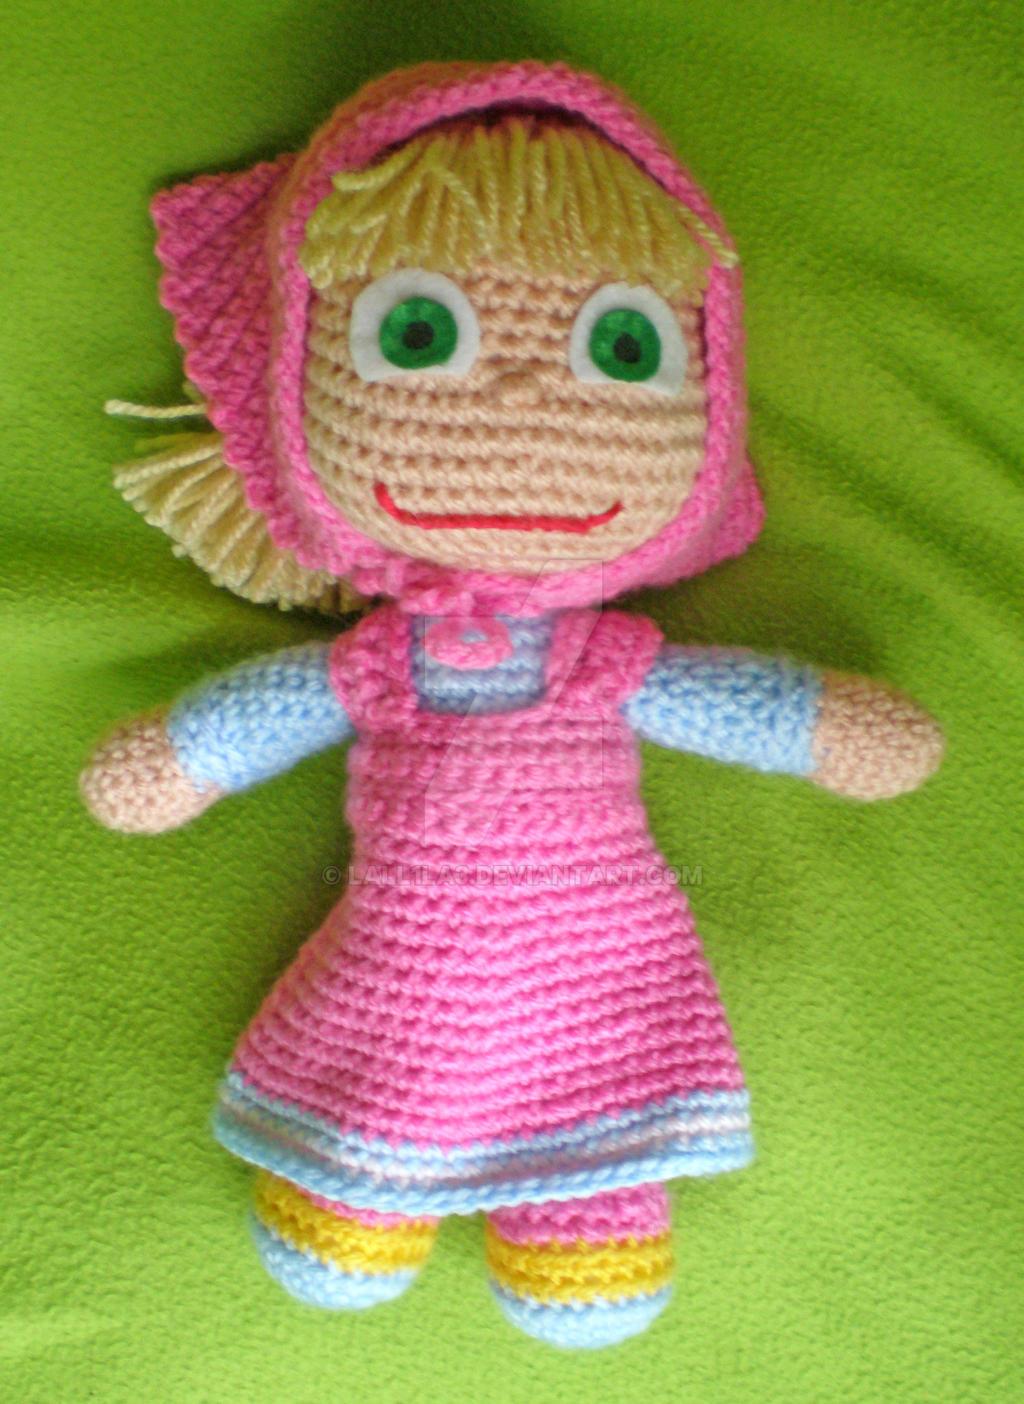 Amigurumi Masha and crochet bear amigurumi Part I – step by step ... | 1404x1024